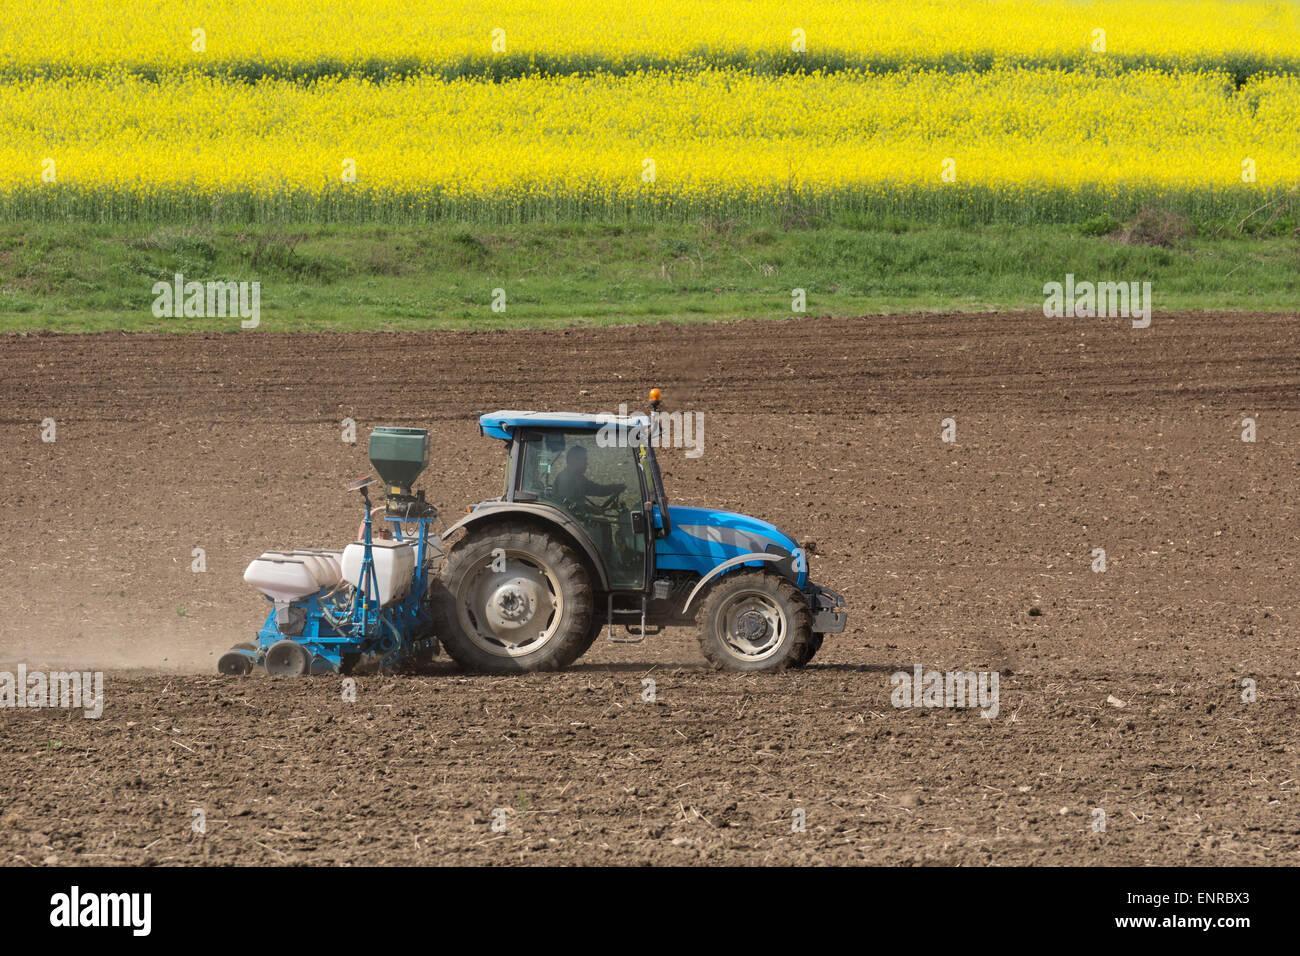 Un campo agrícola con un tractor Imagen De Stock